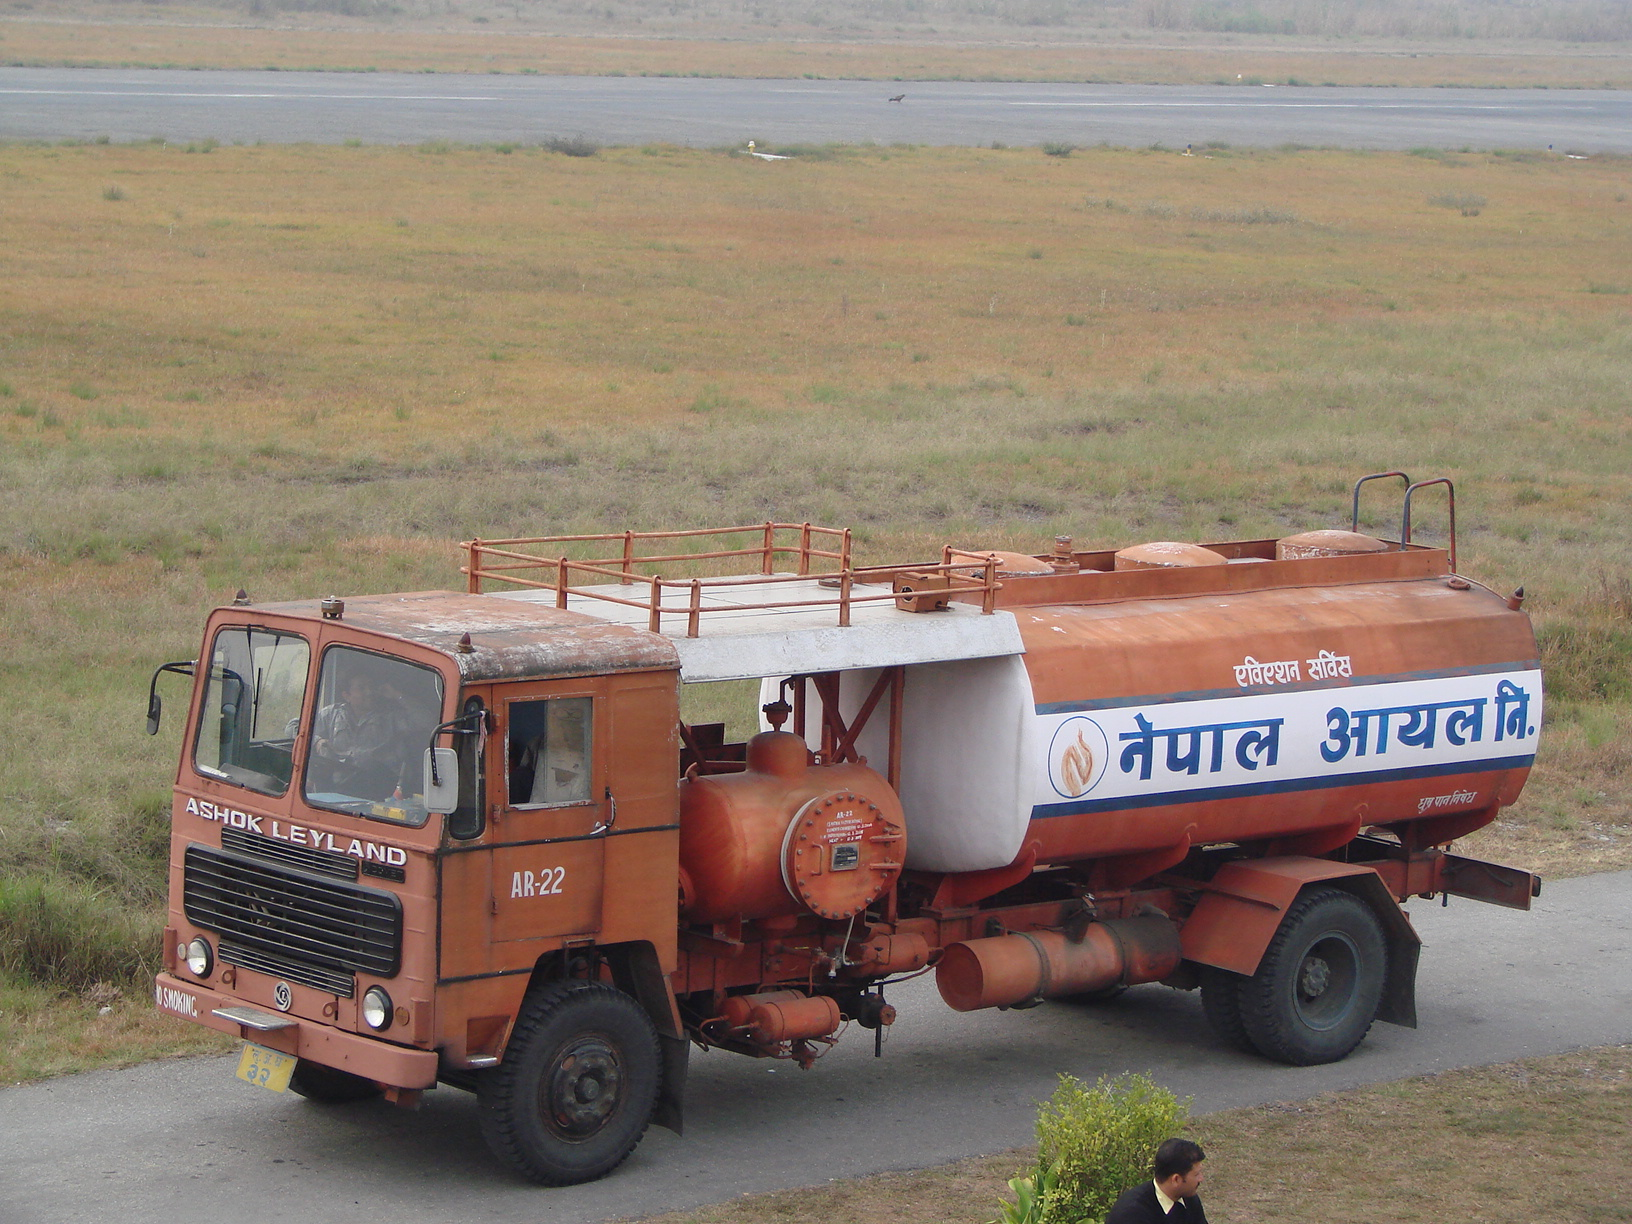 Ashok Leyland Titan Specs Photos Videos And More On